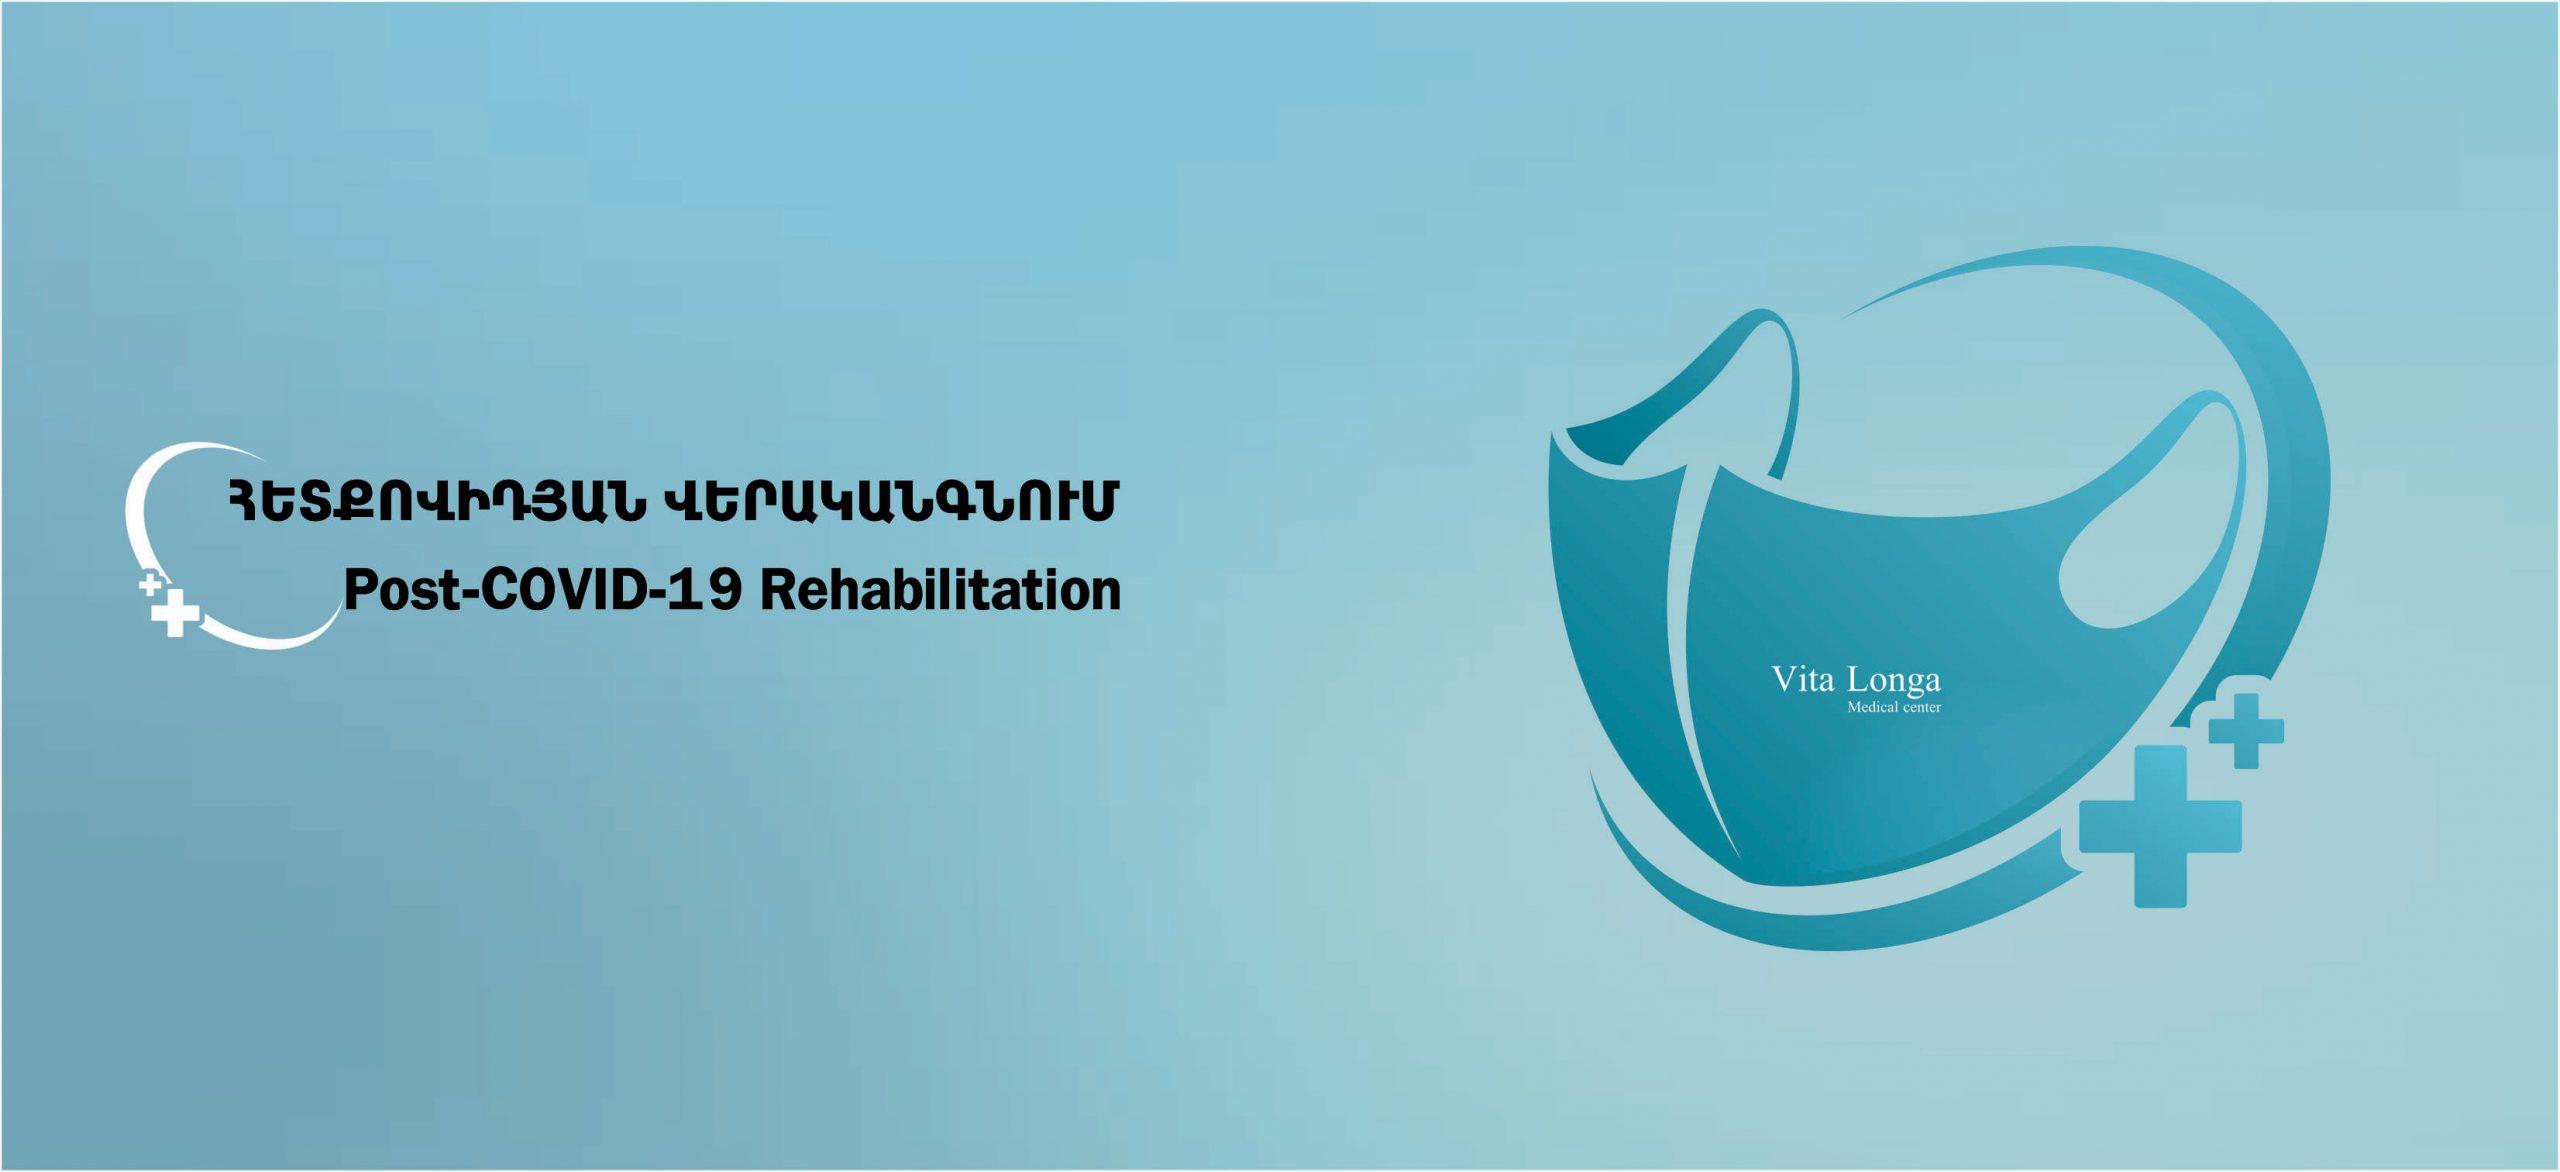 Post-COVID-19 Rehabilitation